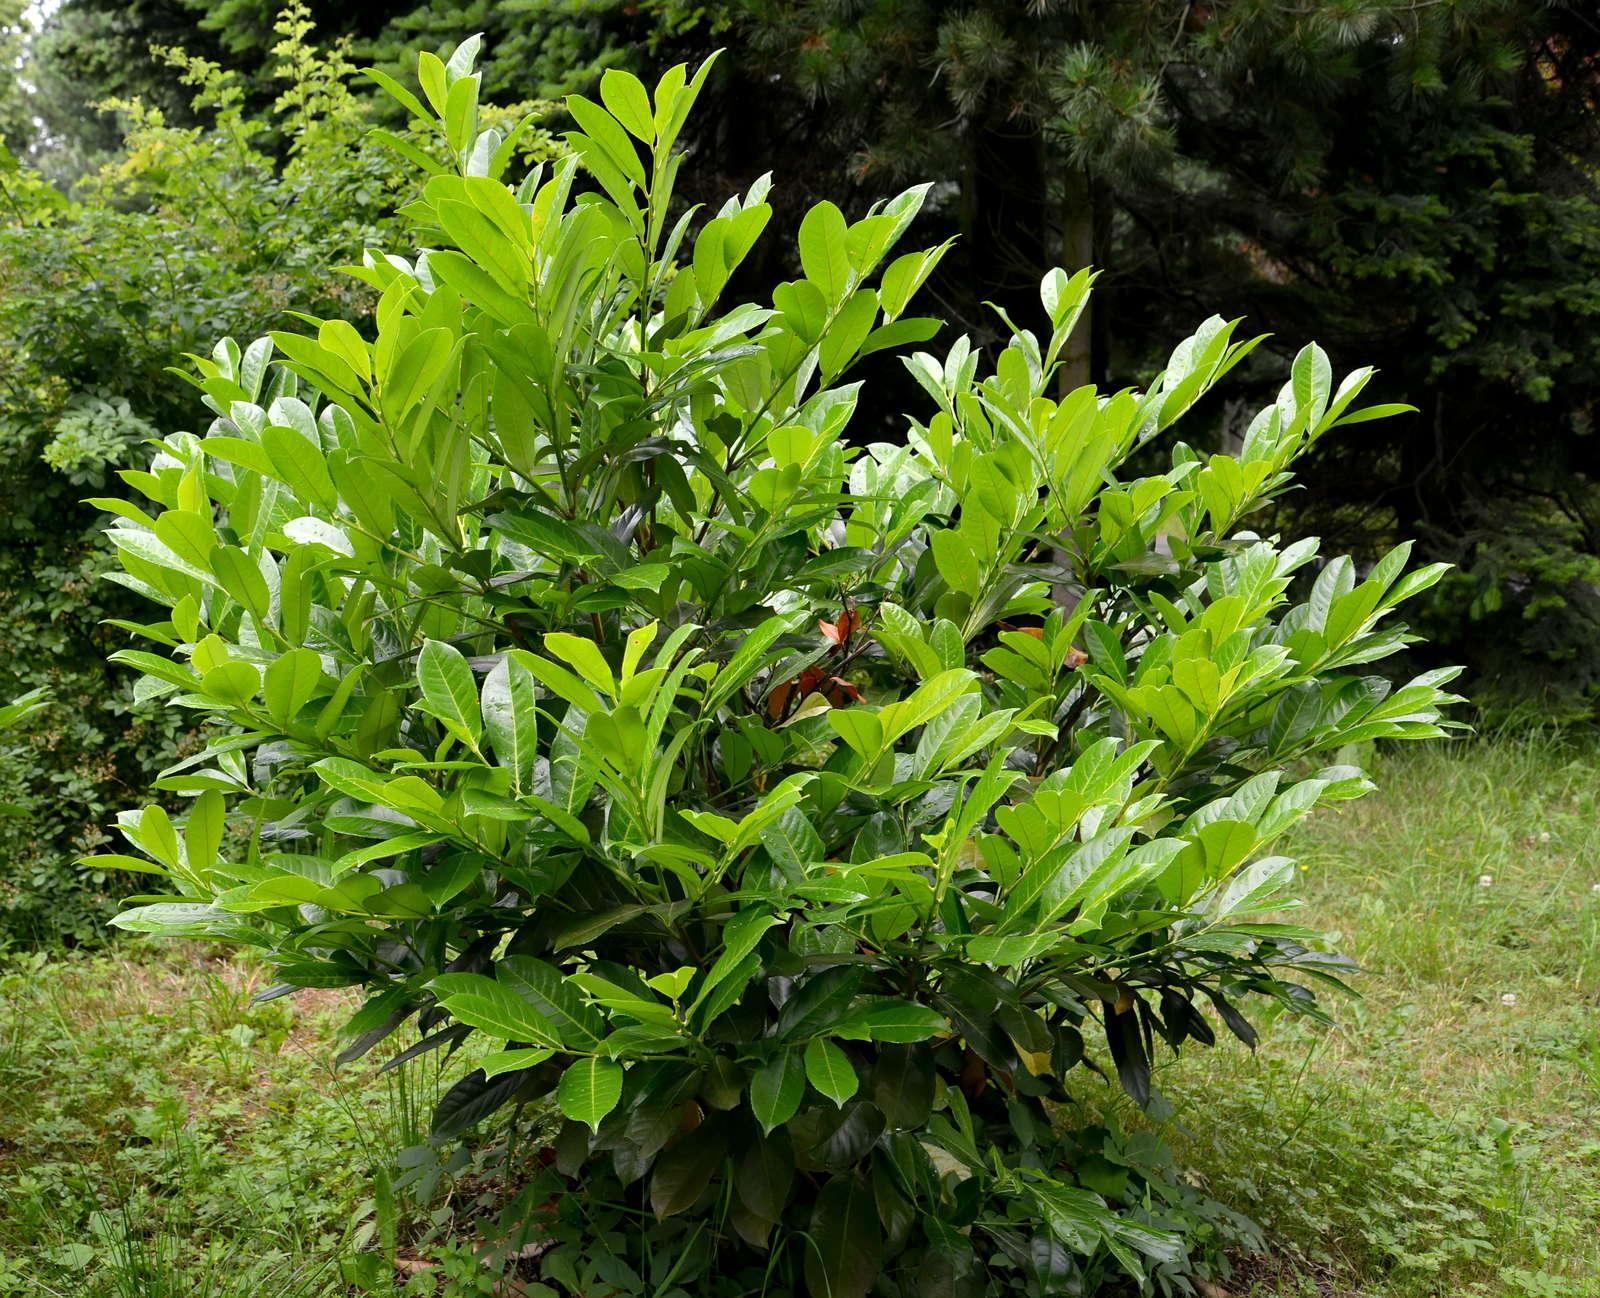 Prächtig Kirschlorbeer vermehren: Tipps & Anleitung vom Profi - Plantura @GJ_78